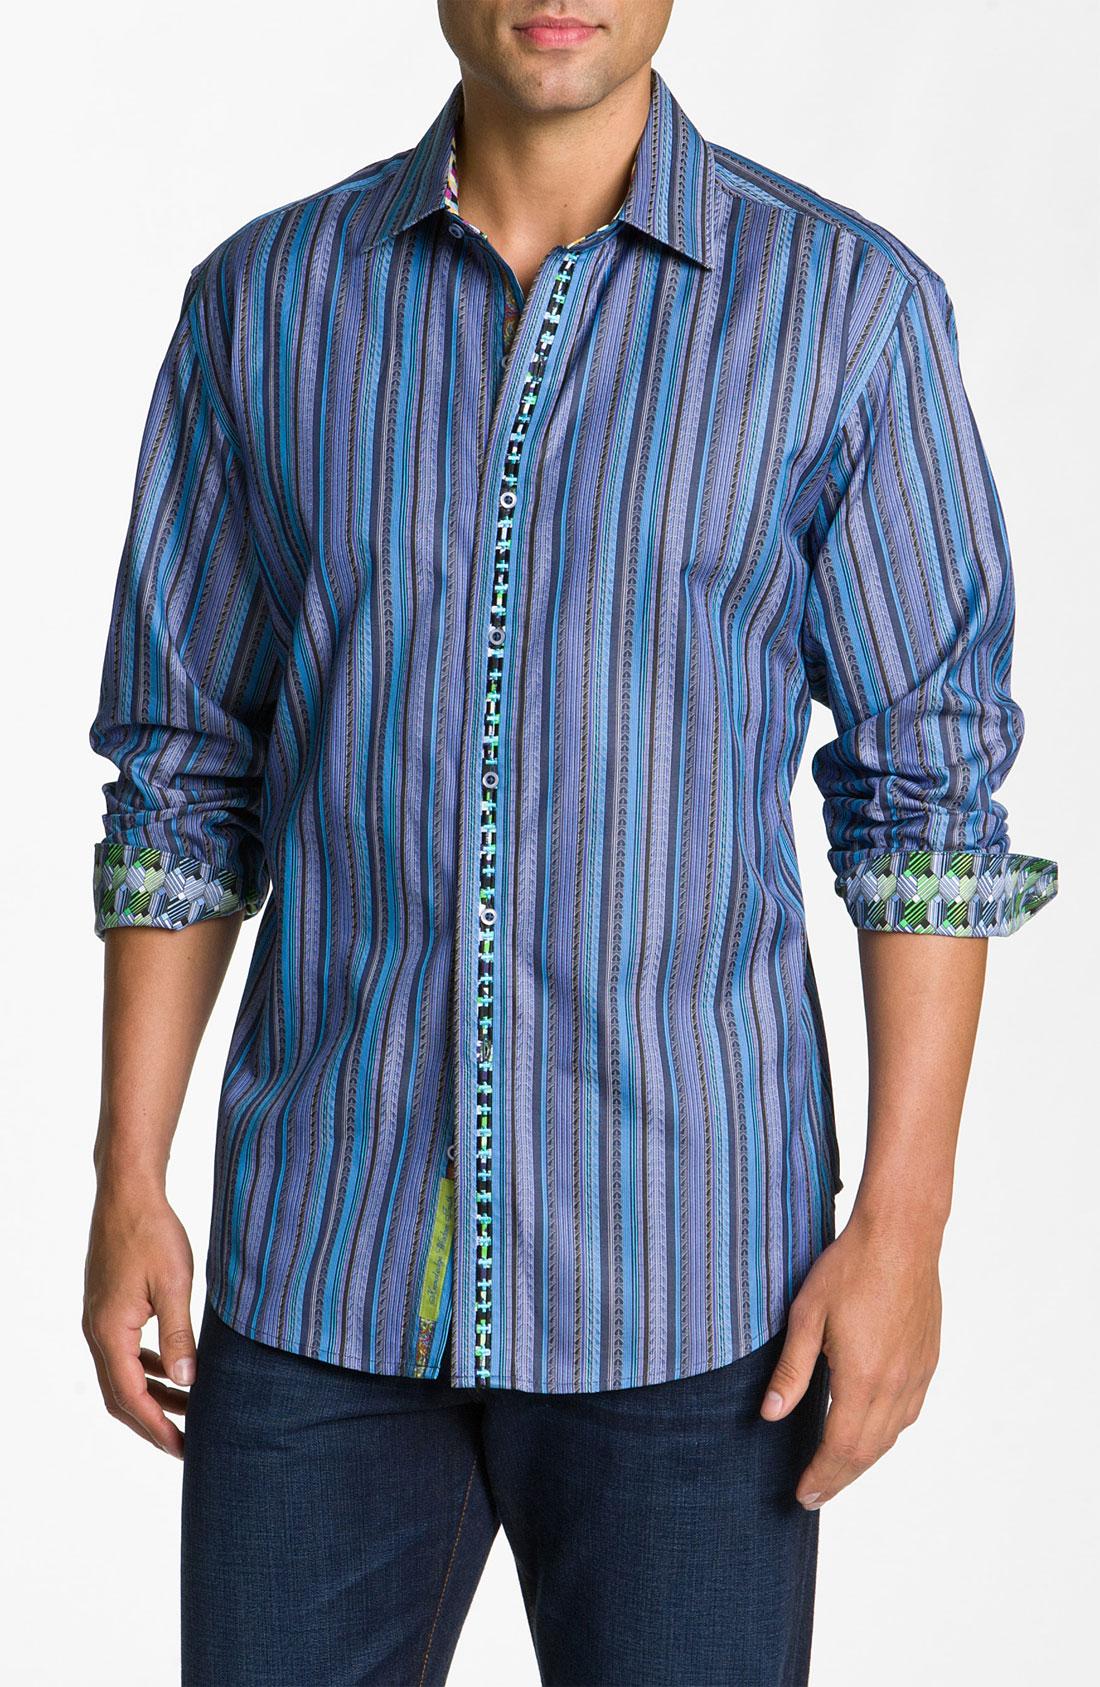 Robert graham melrose abbey woven shirt in blue for men lyst for Robert graham sport shirt